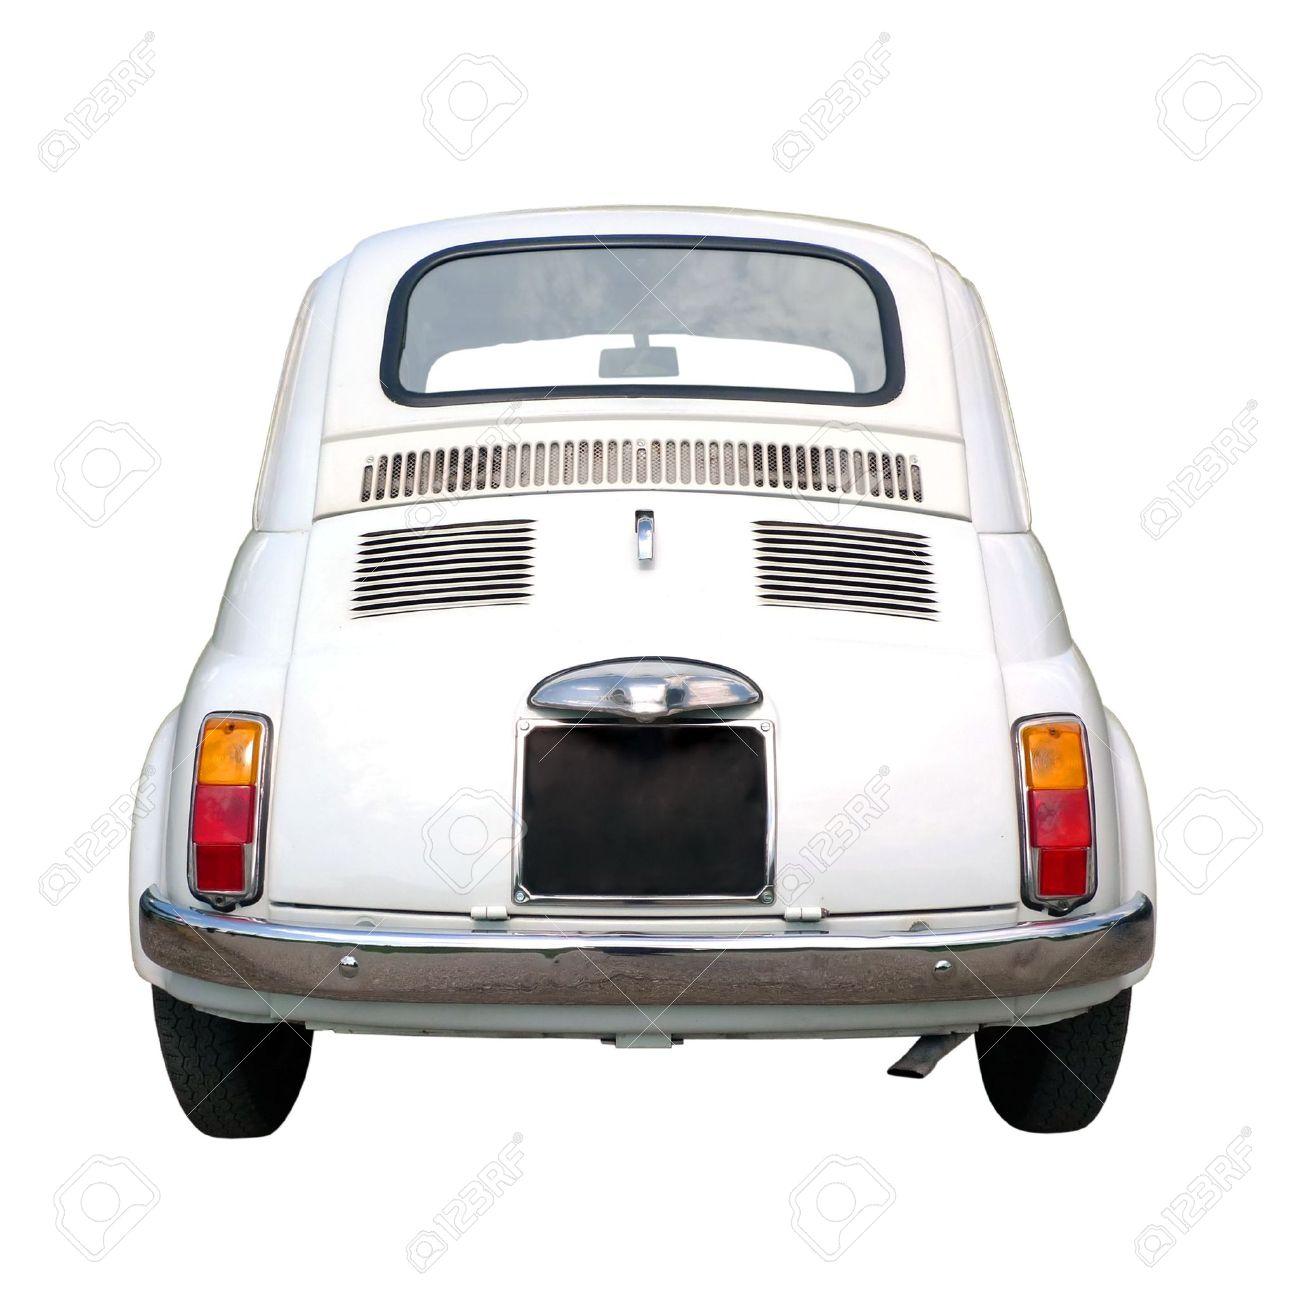 60s vintage italian car isolated on white background Standard-Bild - 5119098